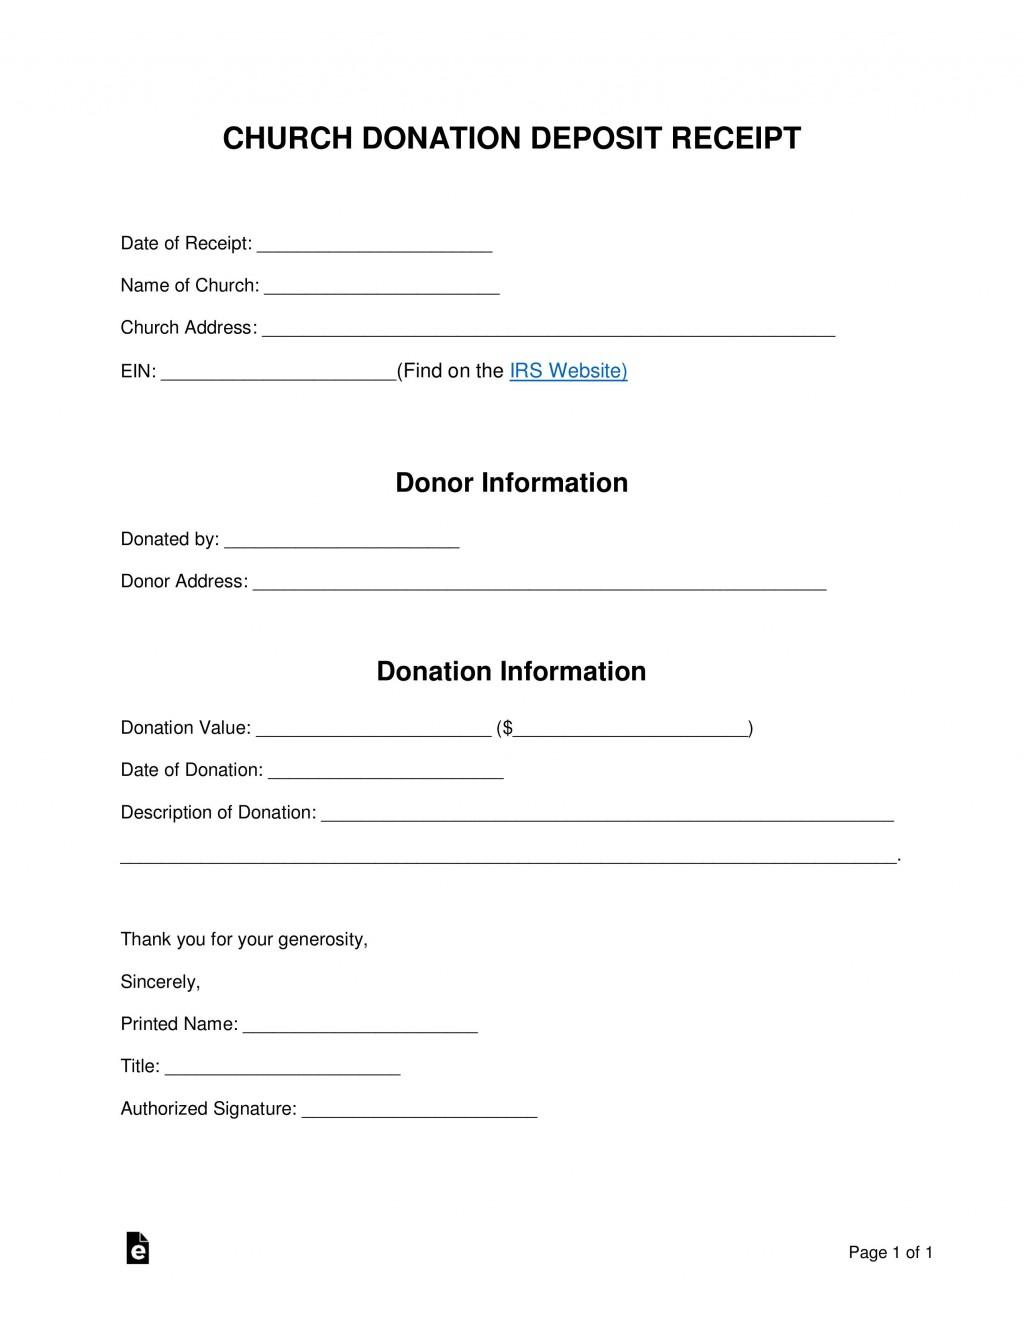 003 Wonderful Tax Donation Receipt Template High Def  Canadian Charitable Letter Church DeductionLarge